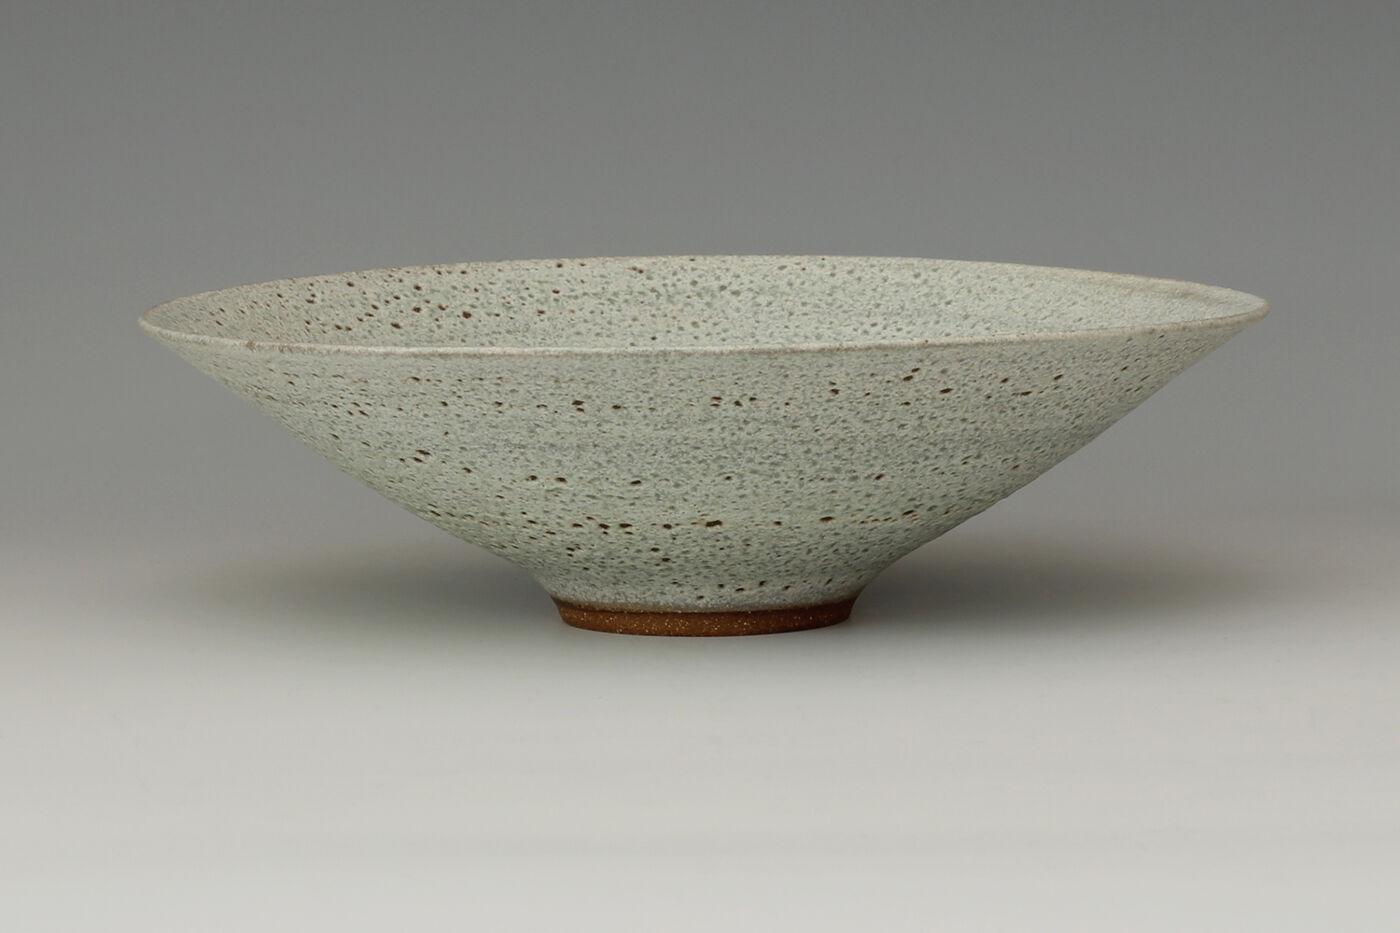 Peter Wills Ceramic Textured Pale Green Bowl 178